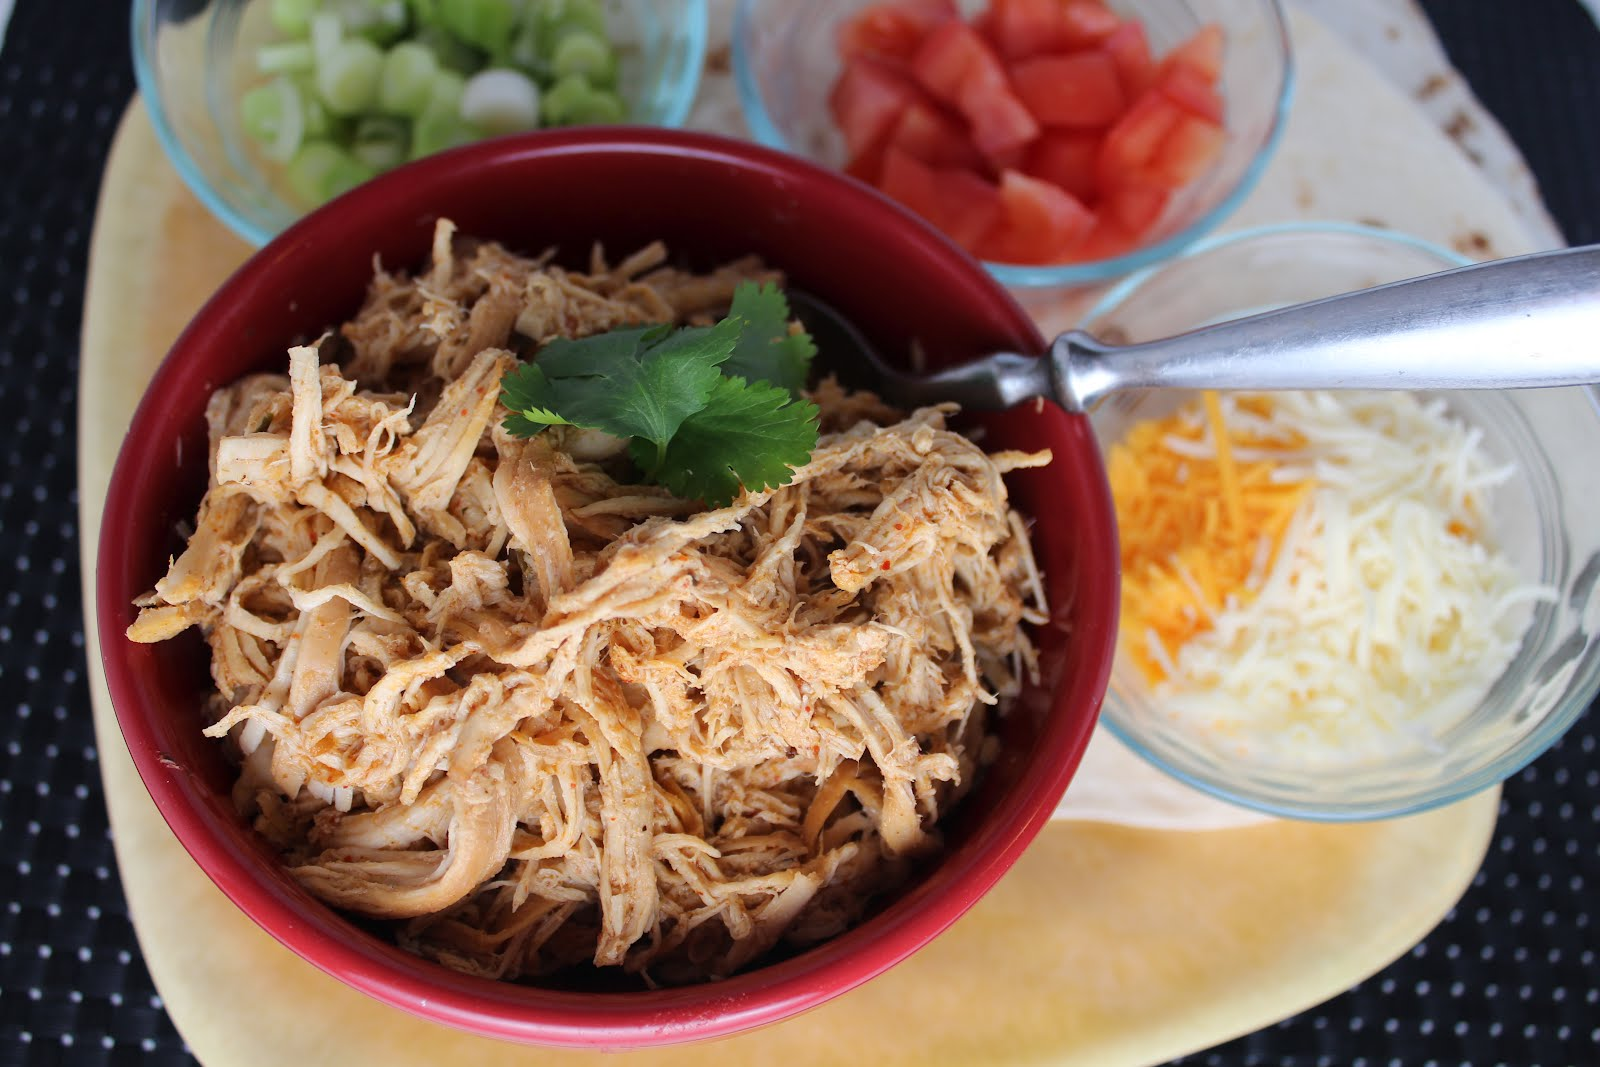 Crock Pot Cafe Rio Copycat Shredded Chicken - Yummy Healthy Easy